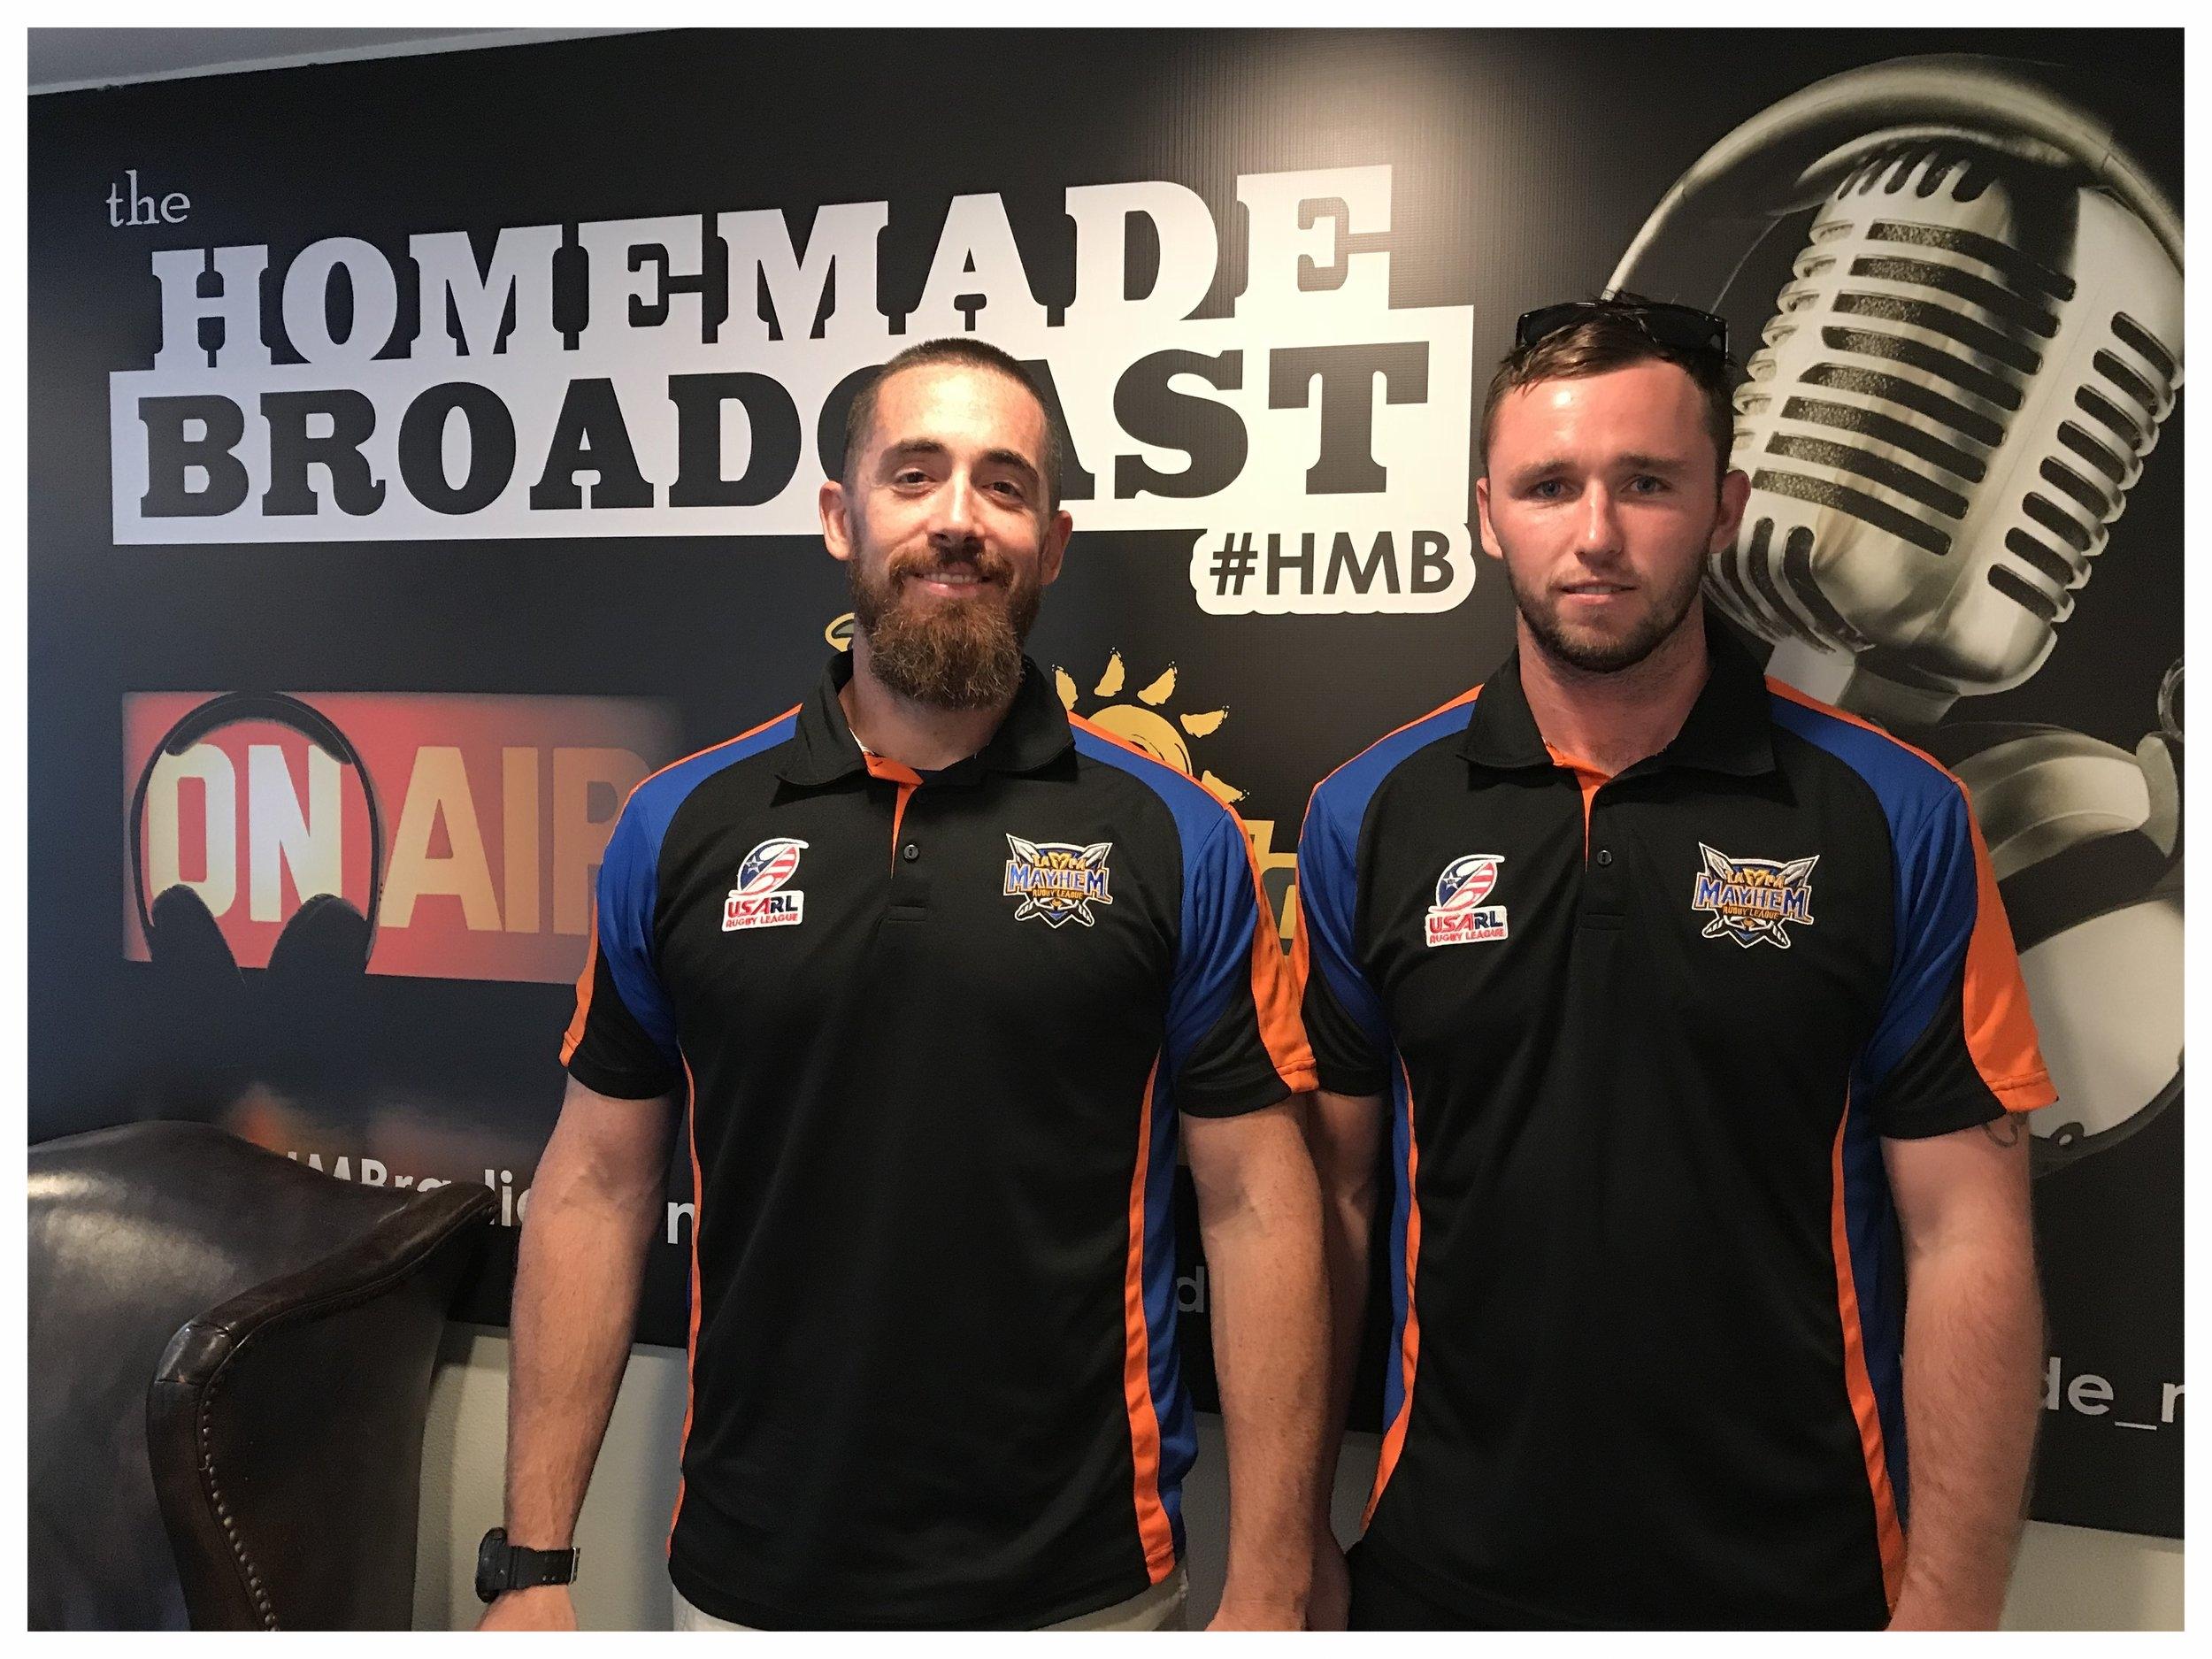 Billy & Josh from the Tampa Mayhem Rugby Club